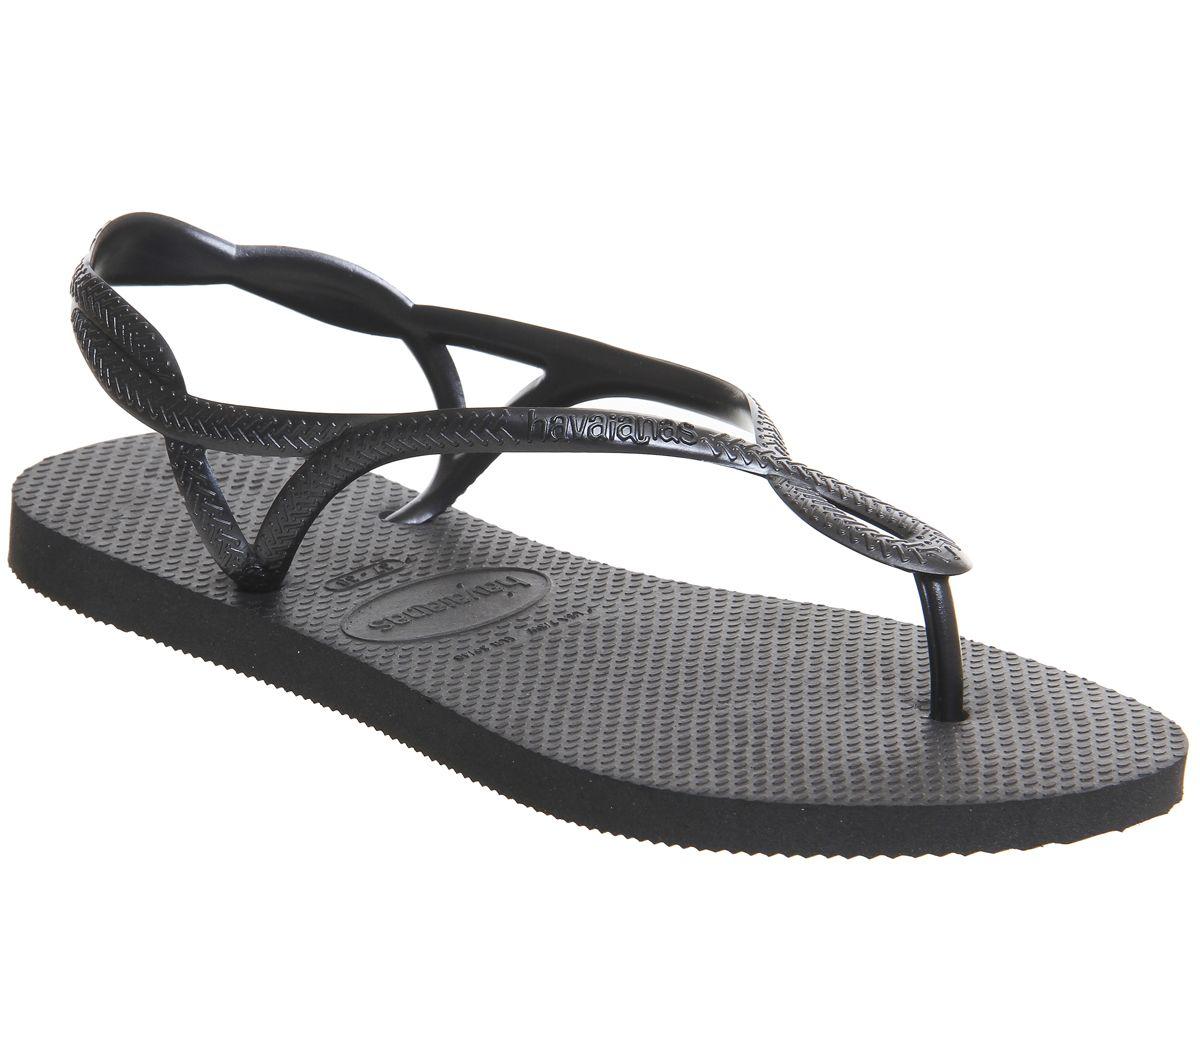 7776b0f03 Havaianas Luna Flip Flops Black - Sandals